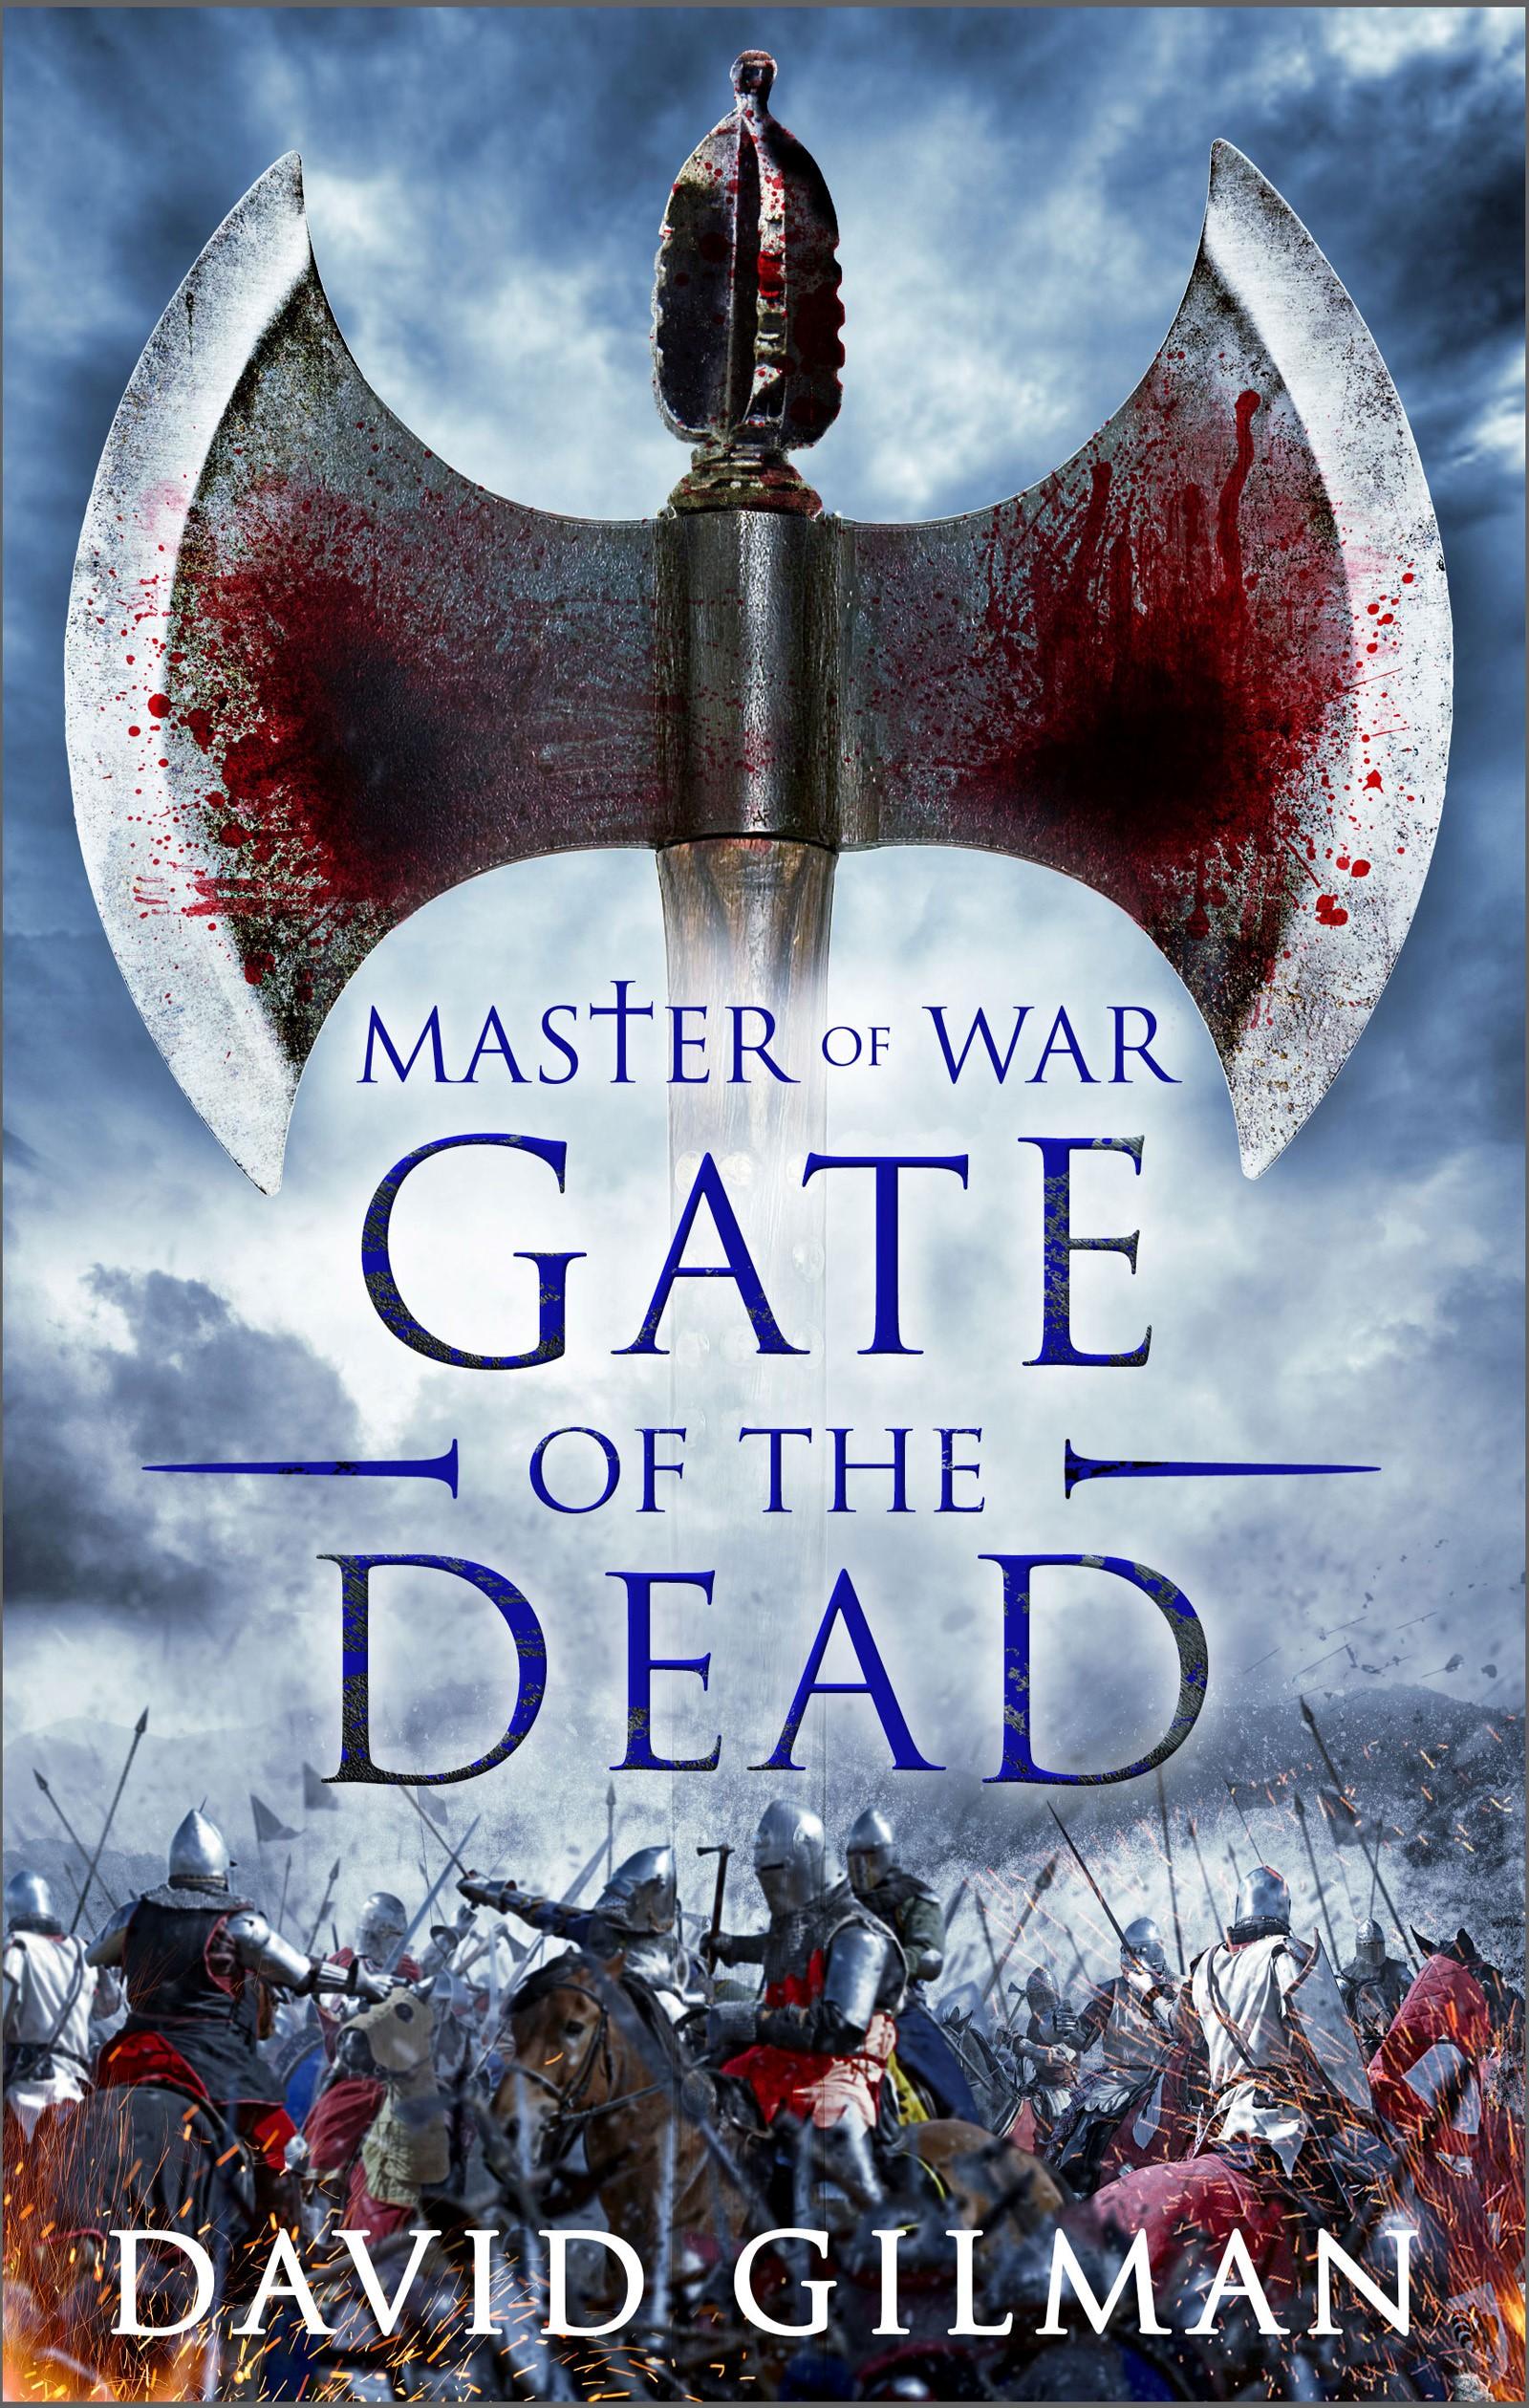 The Dead (David Blake Book 3)